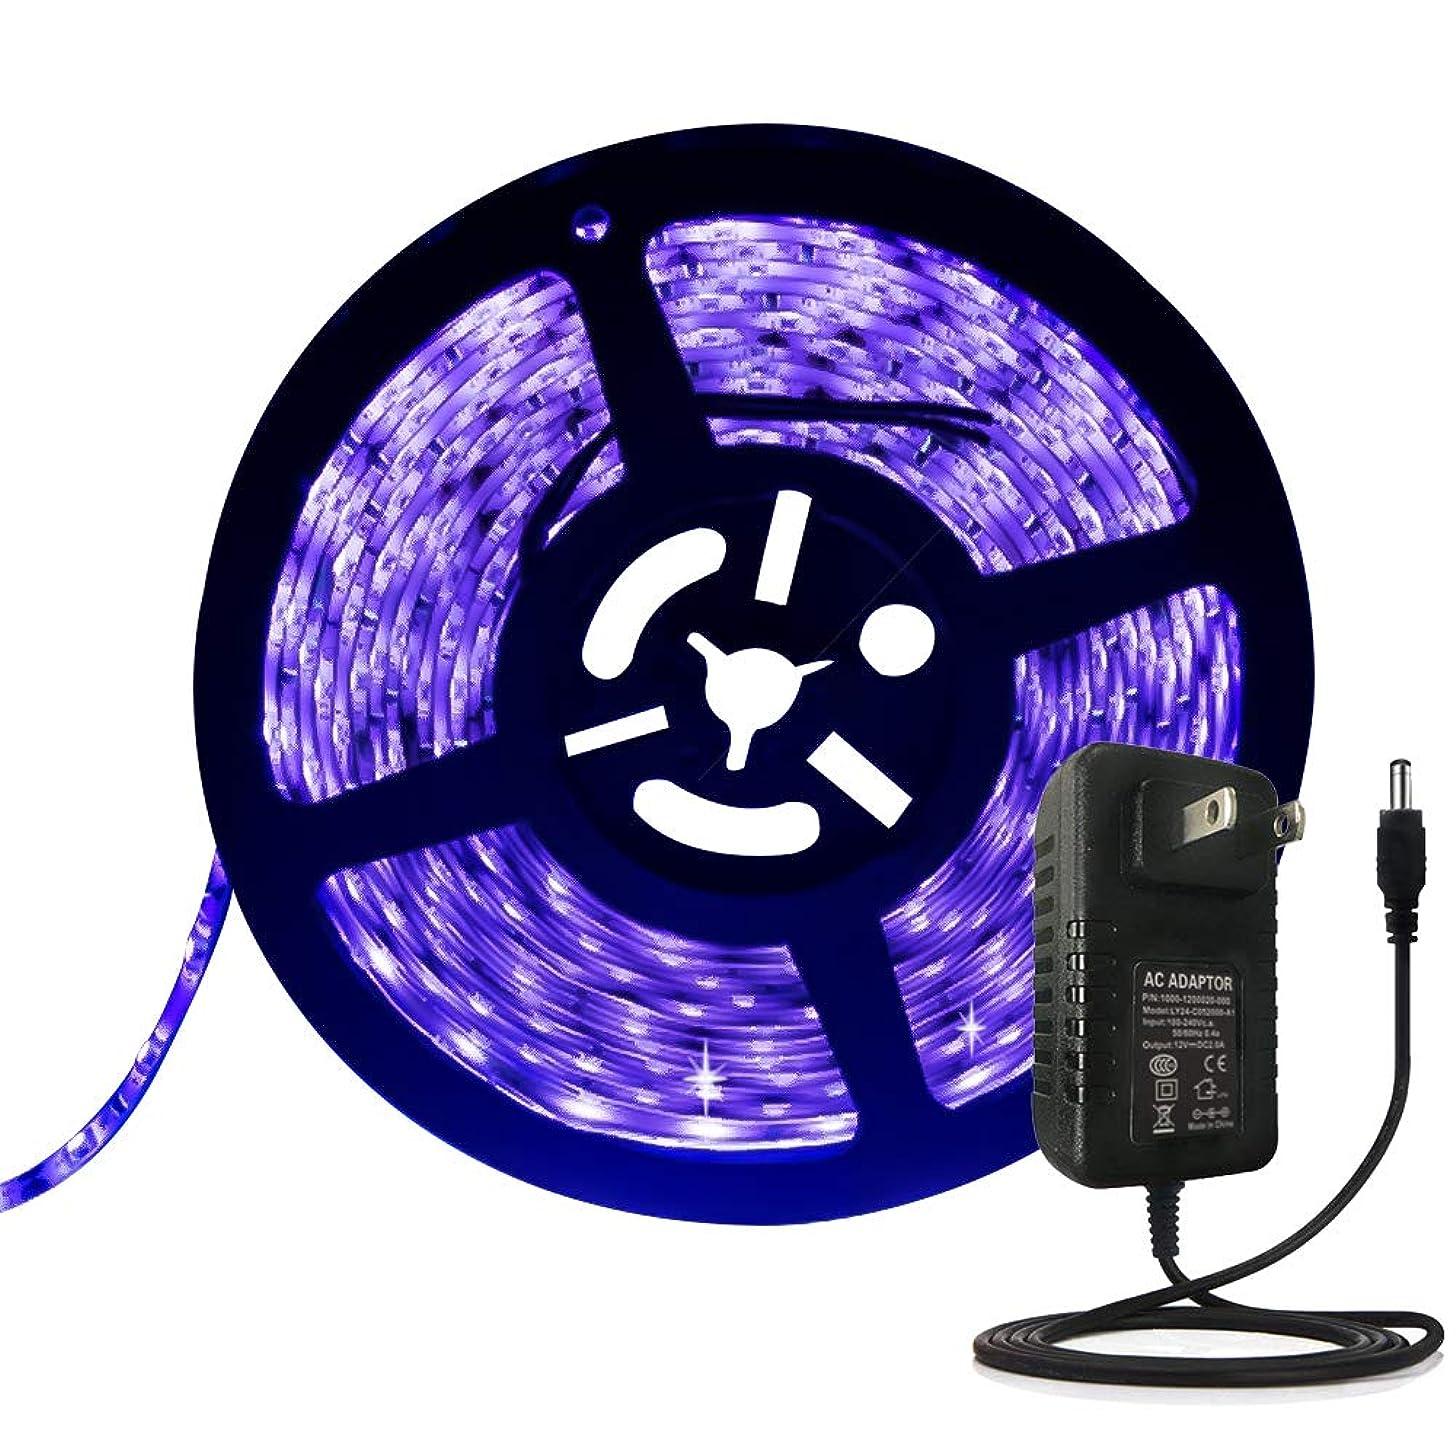 ANJAYLIA Black Light UV LED Strip 16.4ft 300leds Blacklight Strip Waterproof IP65 with 12V 2A Power Supply